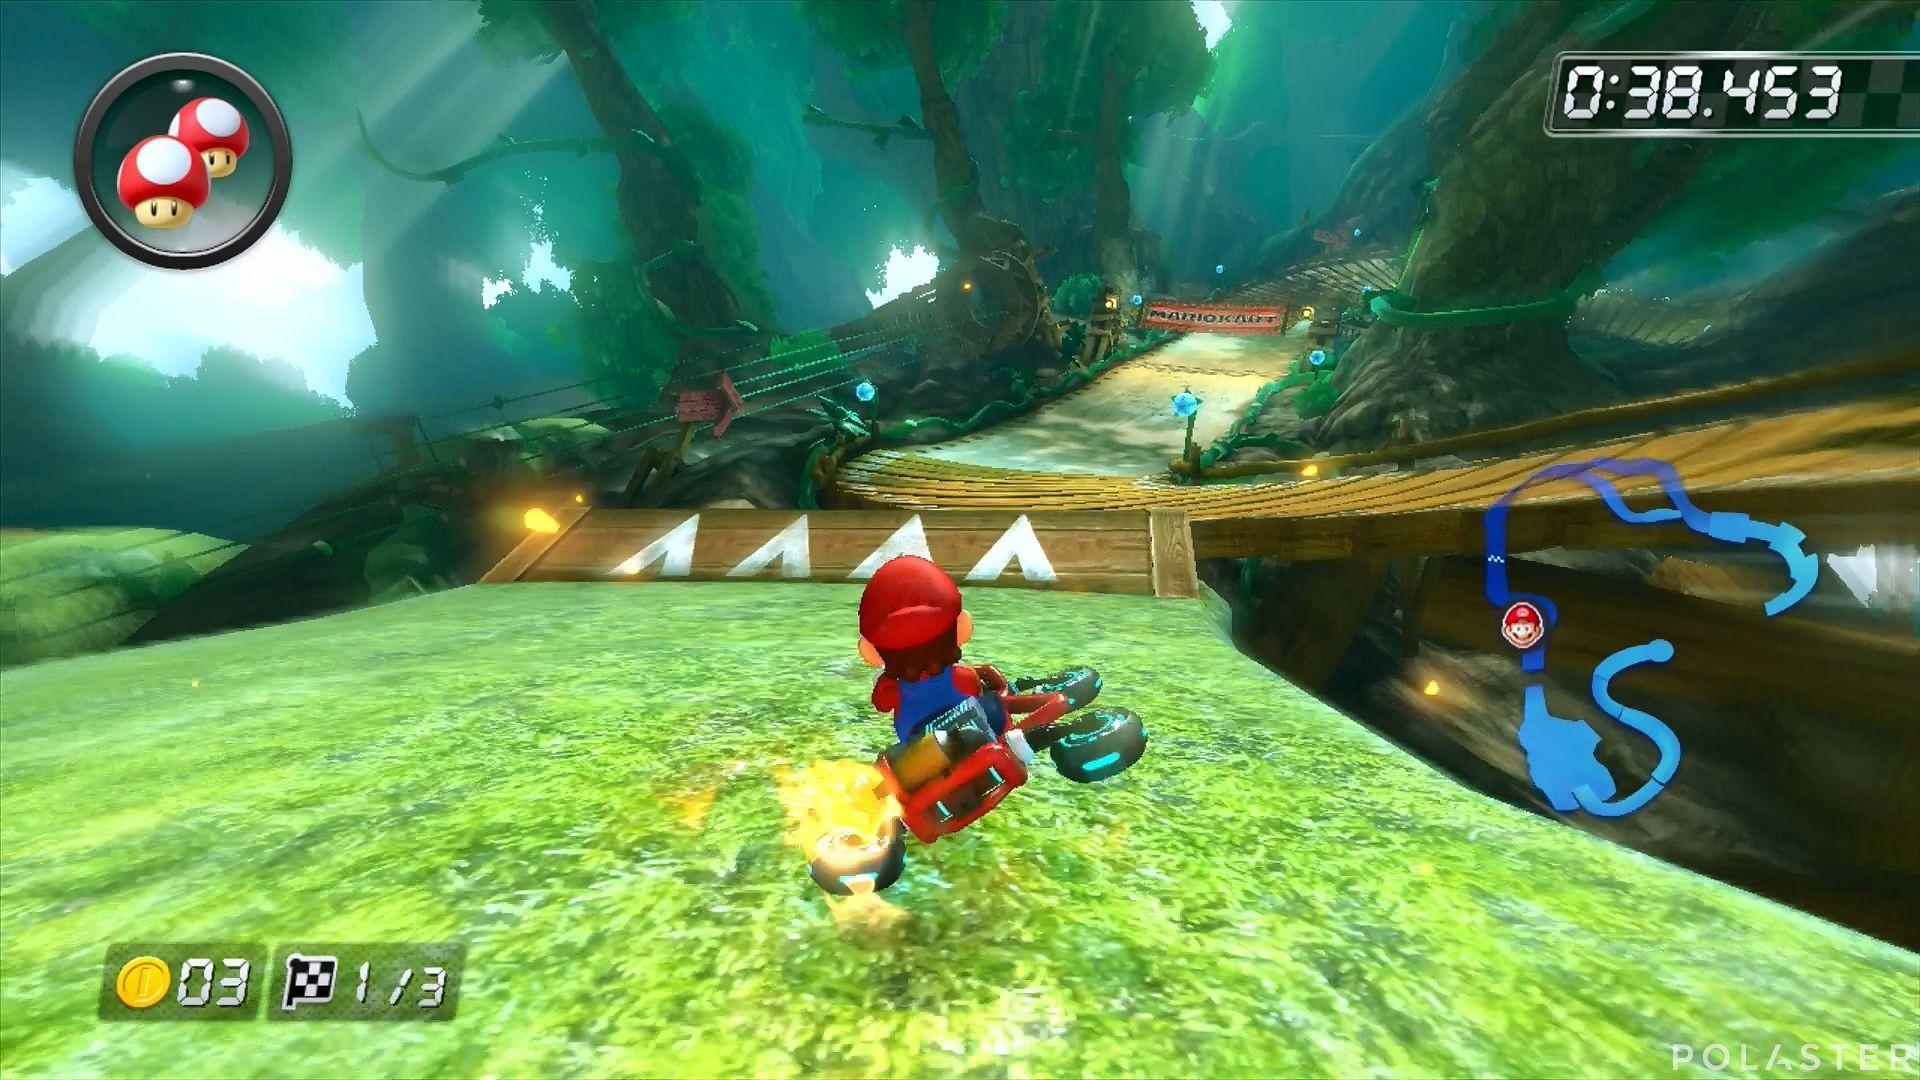 Mario Kart 8 - Bosque Mágico